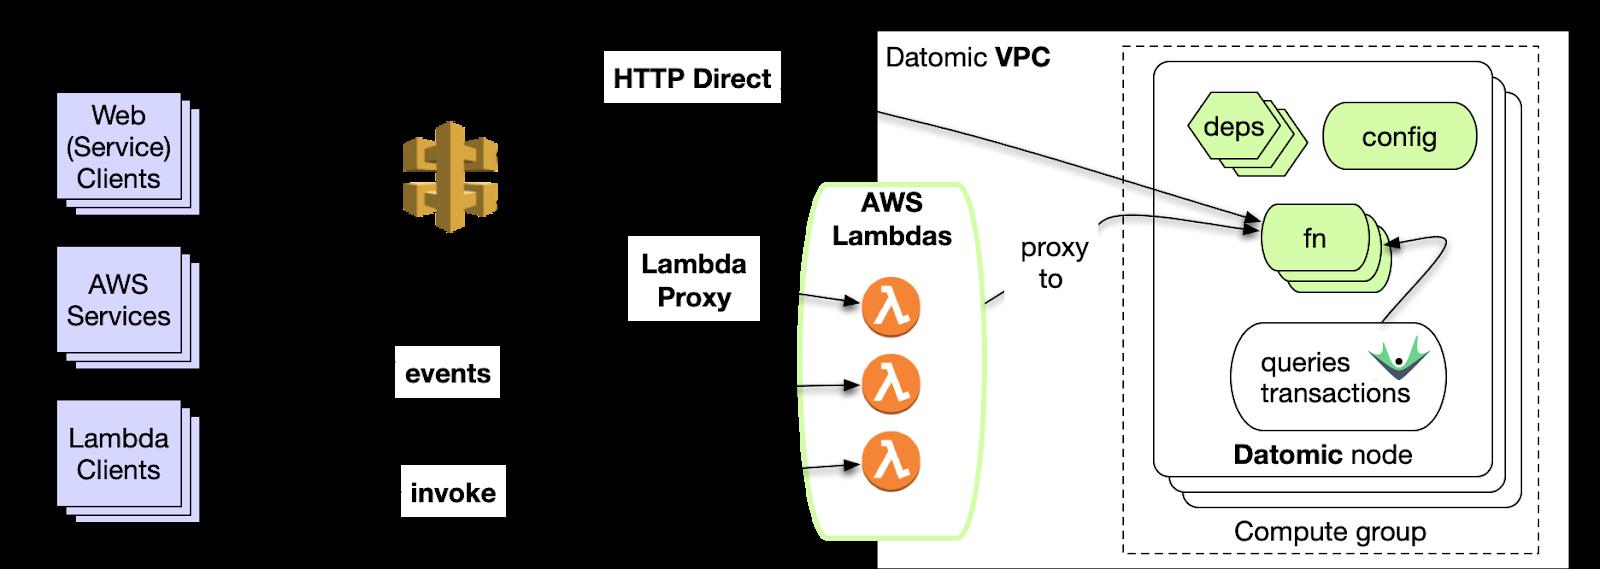 Datomic: HTTP Direct for Datomic Cloud